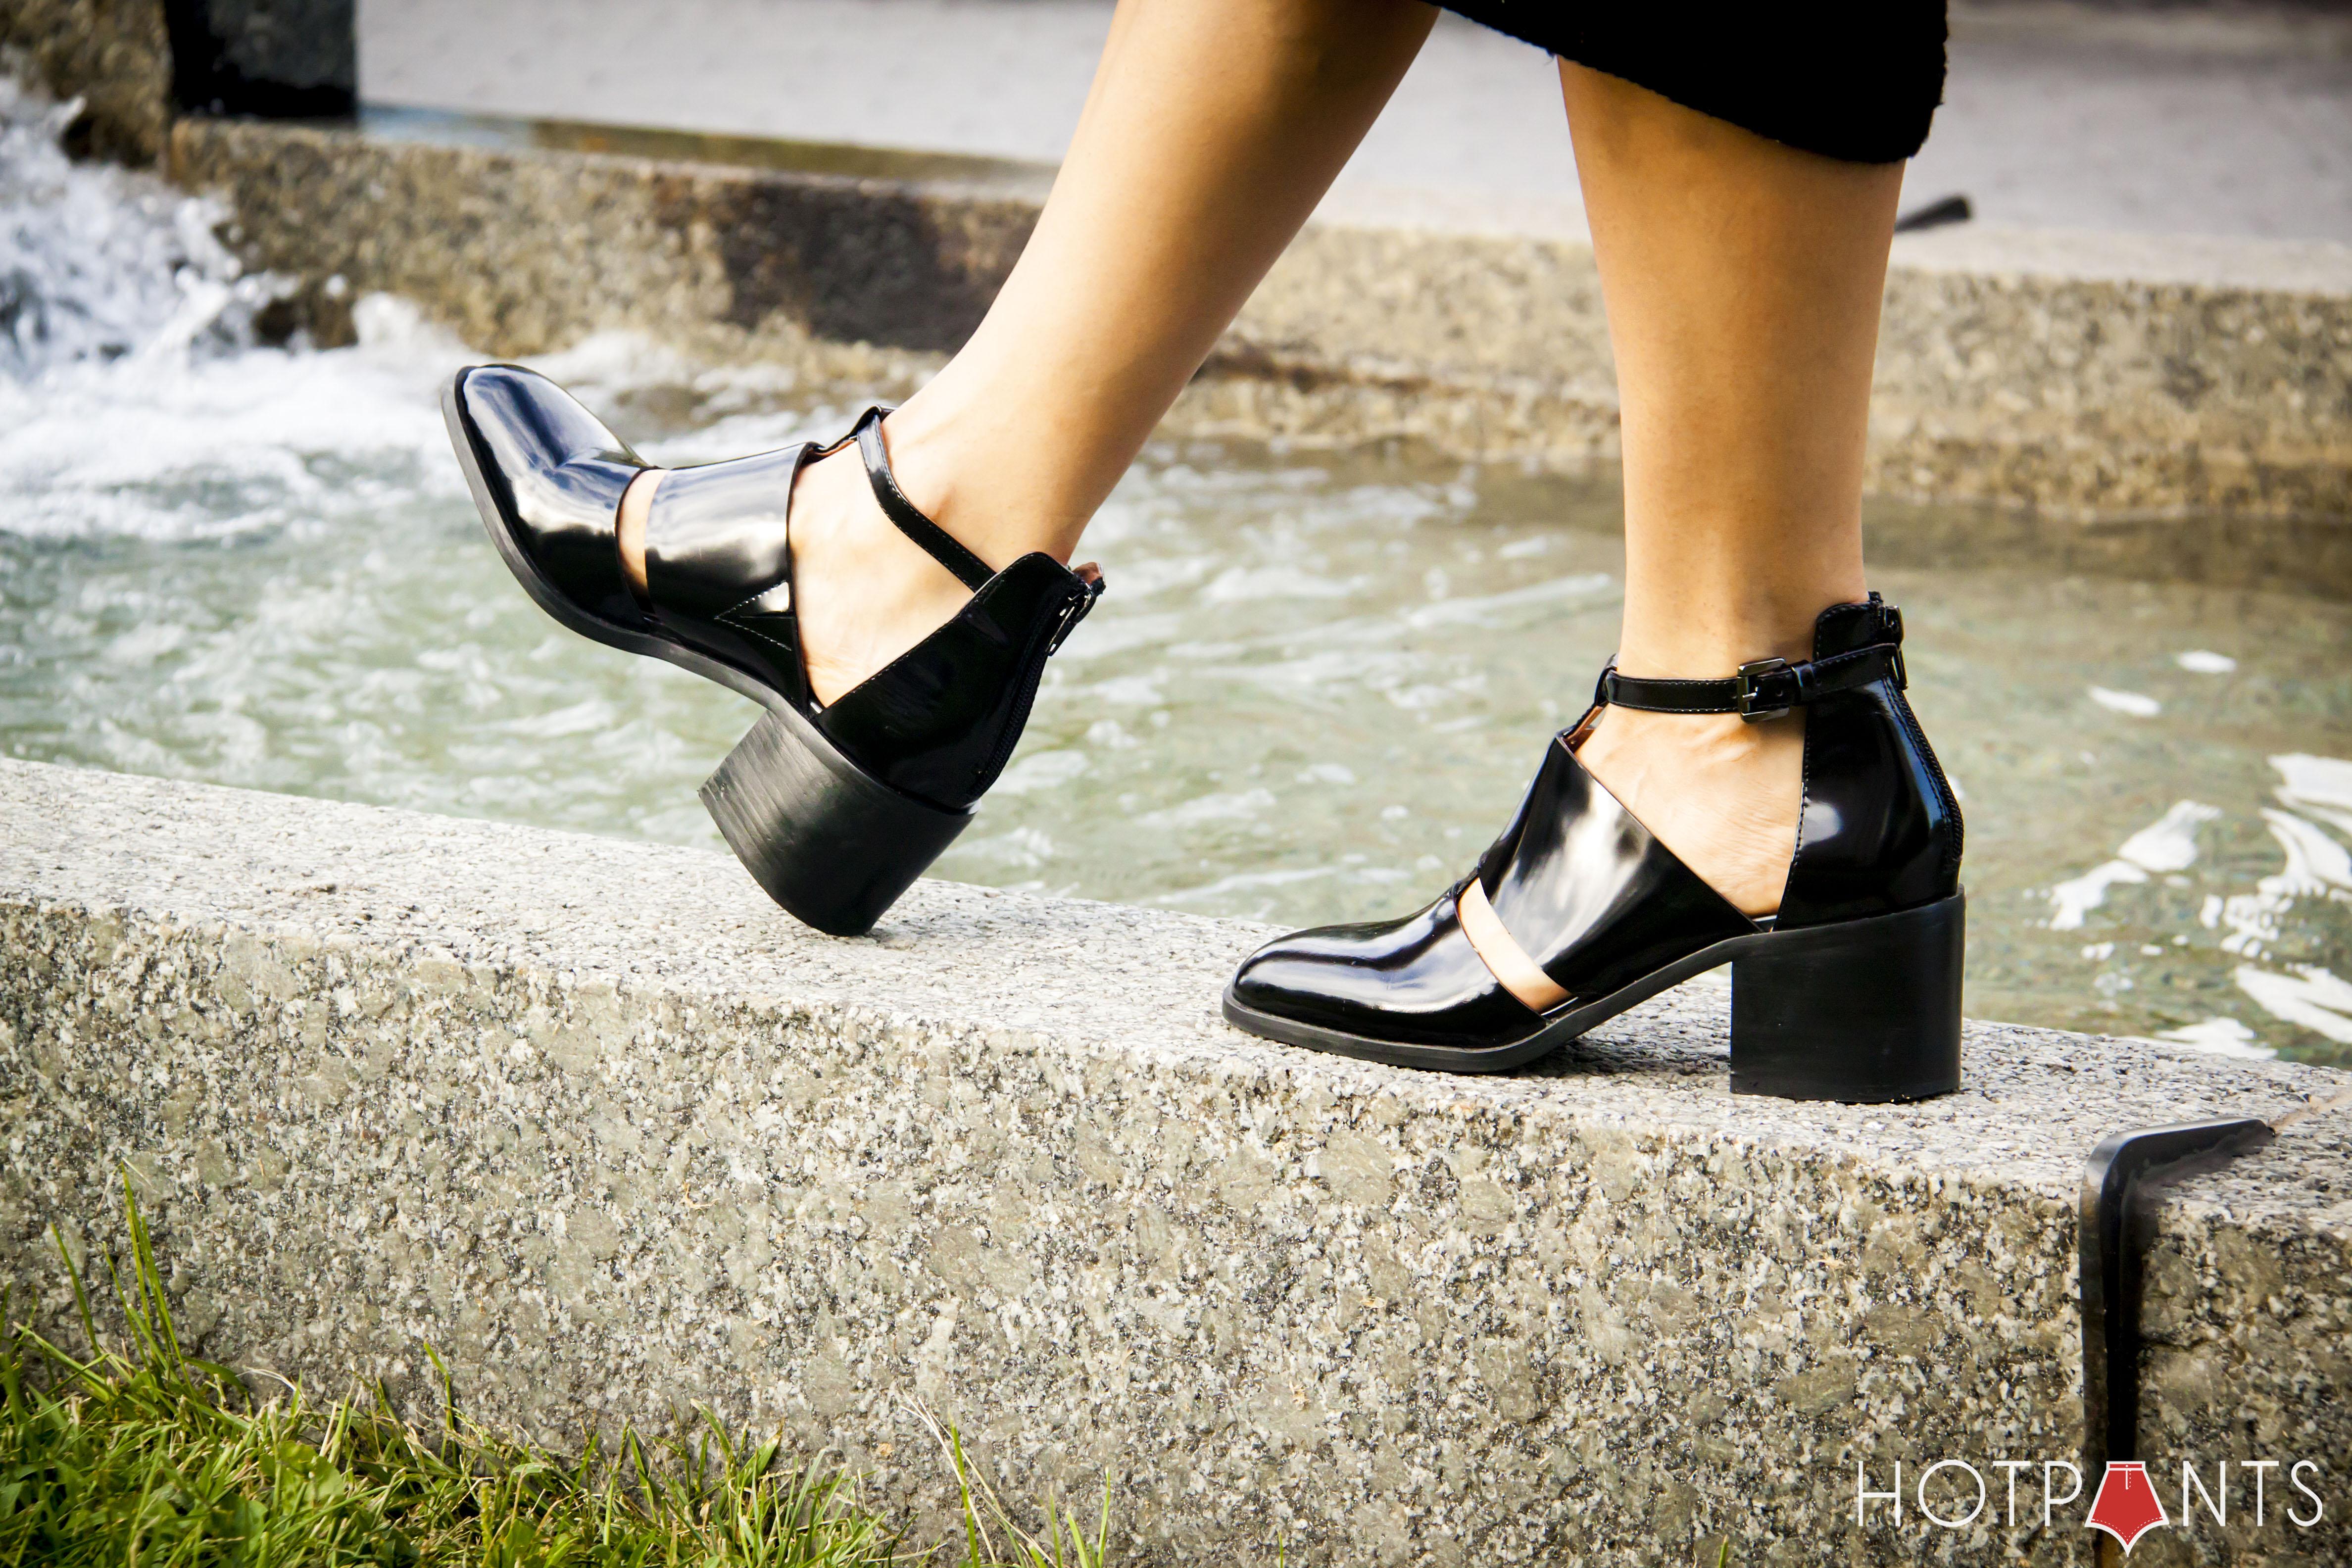 Poodle Puppy Black Alexander Wang Cutout Ankle Boots